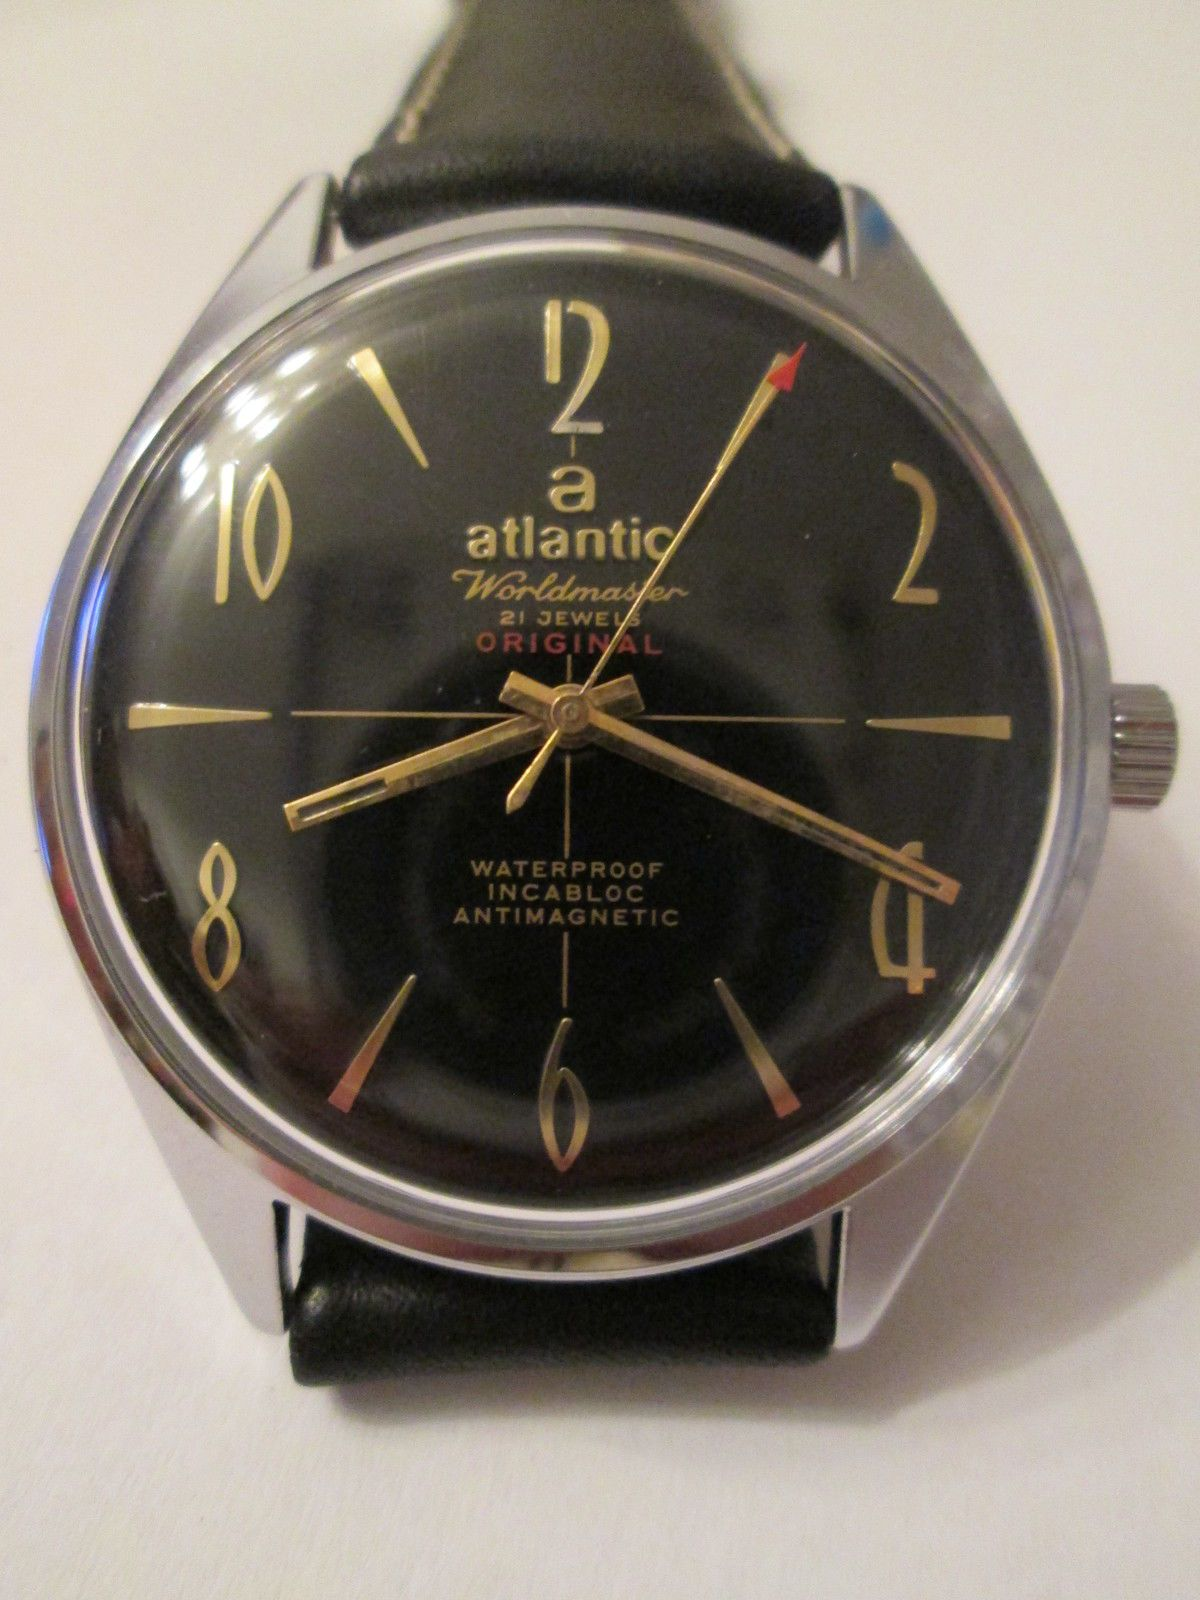 ATLANTIC WORLDMASTER 21 jewels SWISS MADE watch  4e9aceceb8